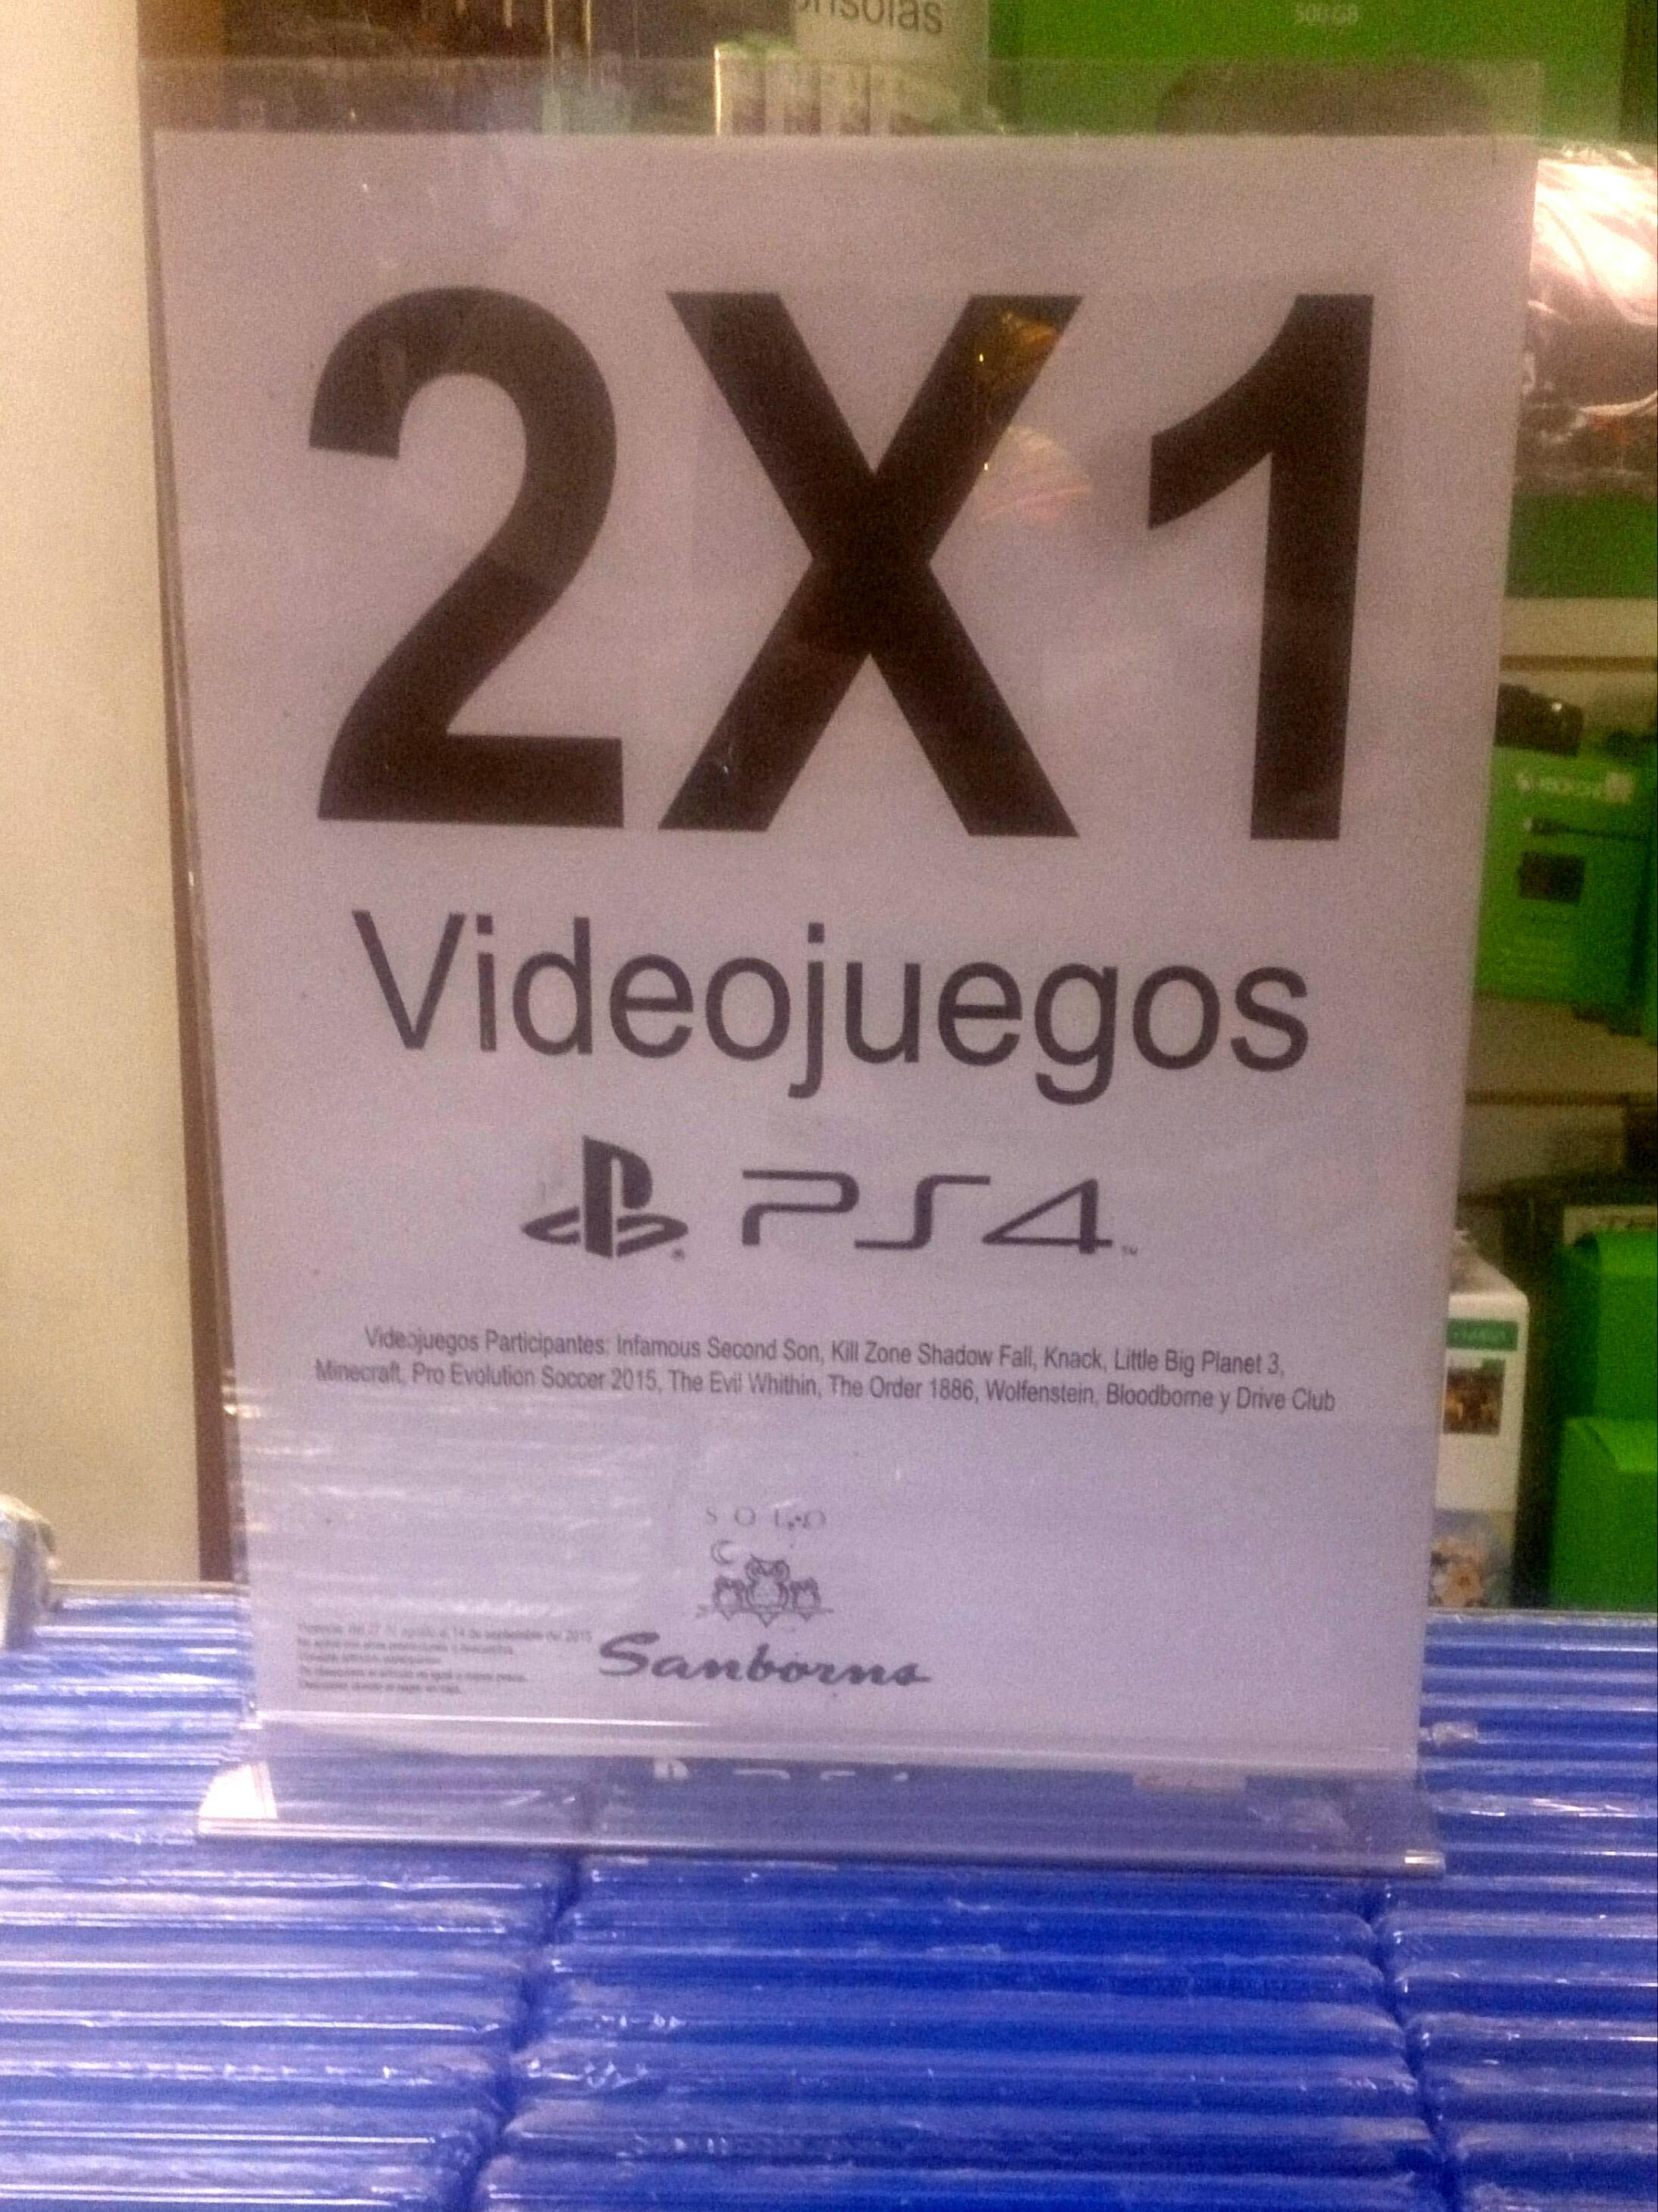 Sanborns: 2x1 Juegos PS4